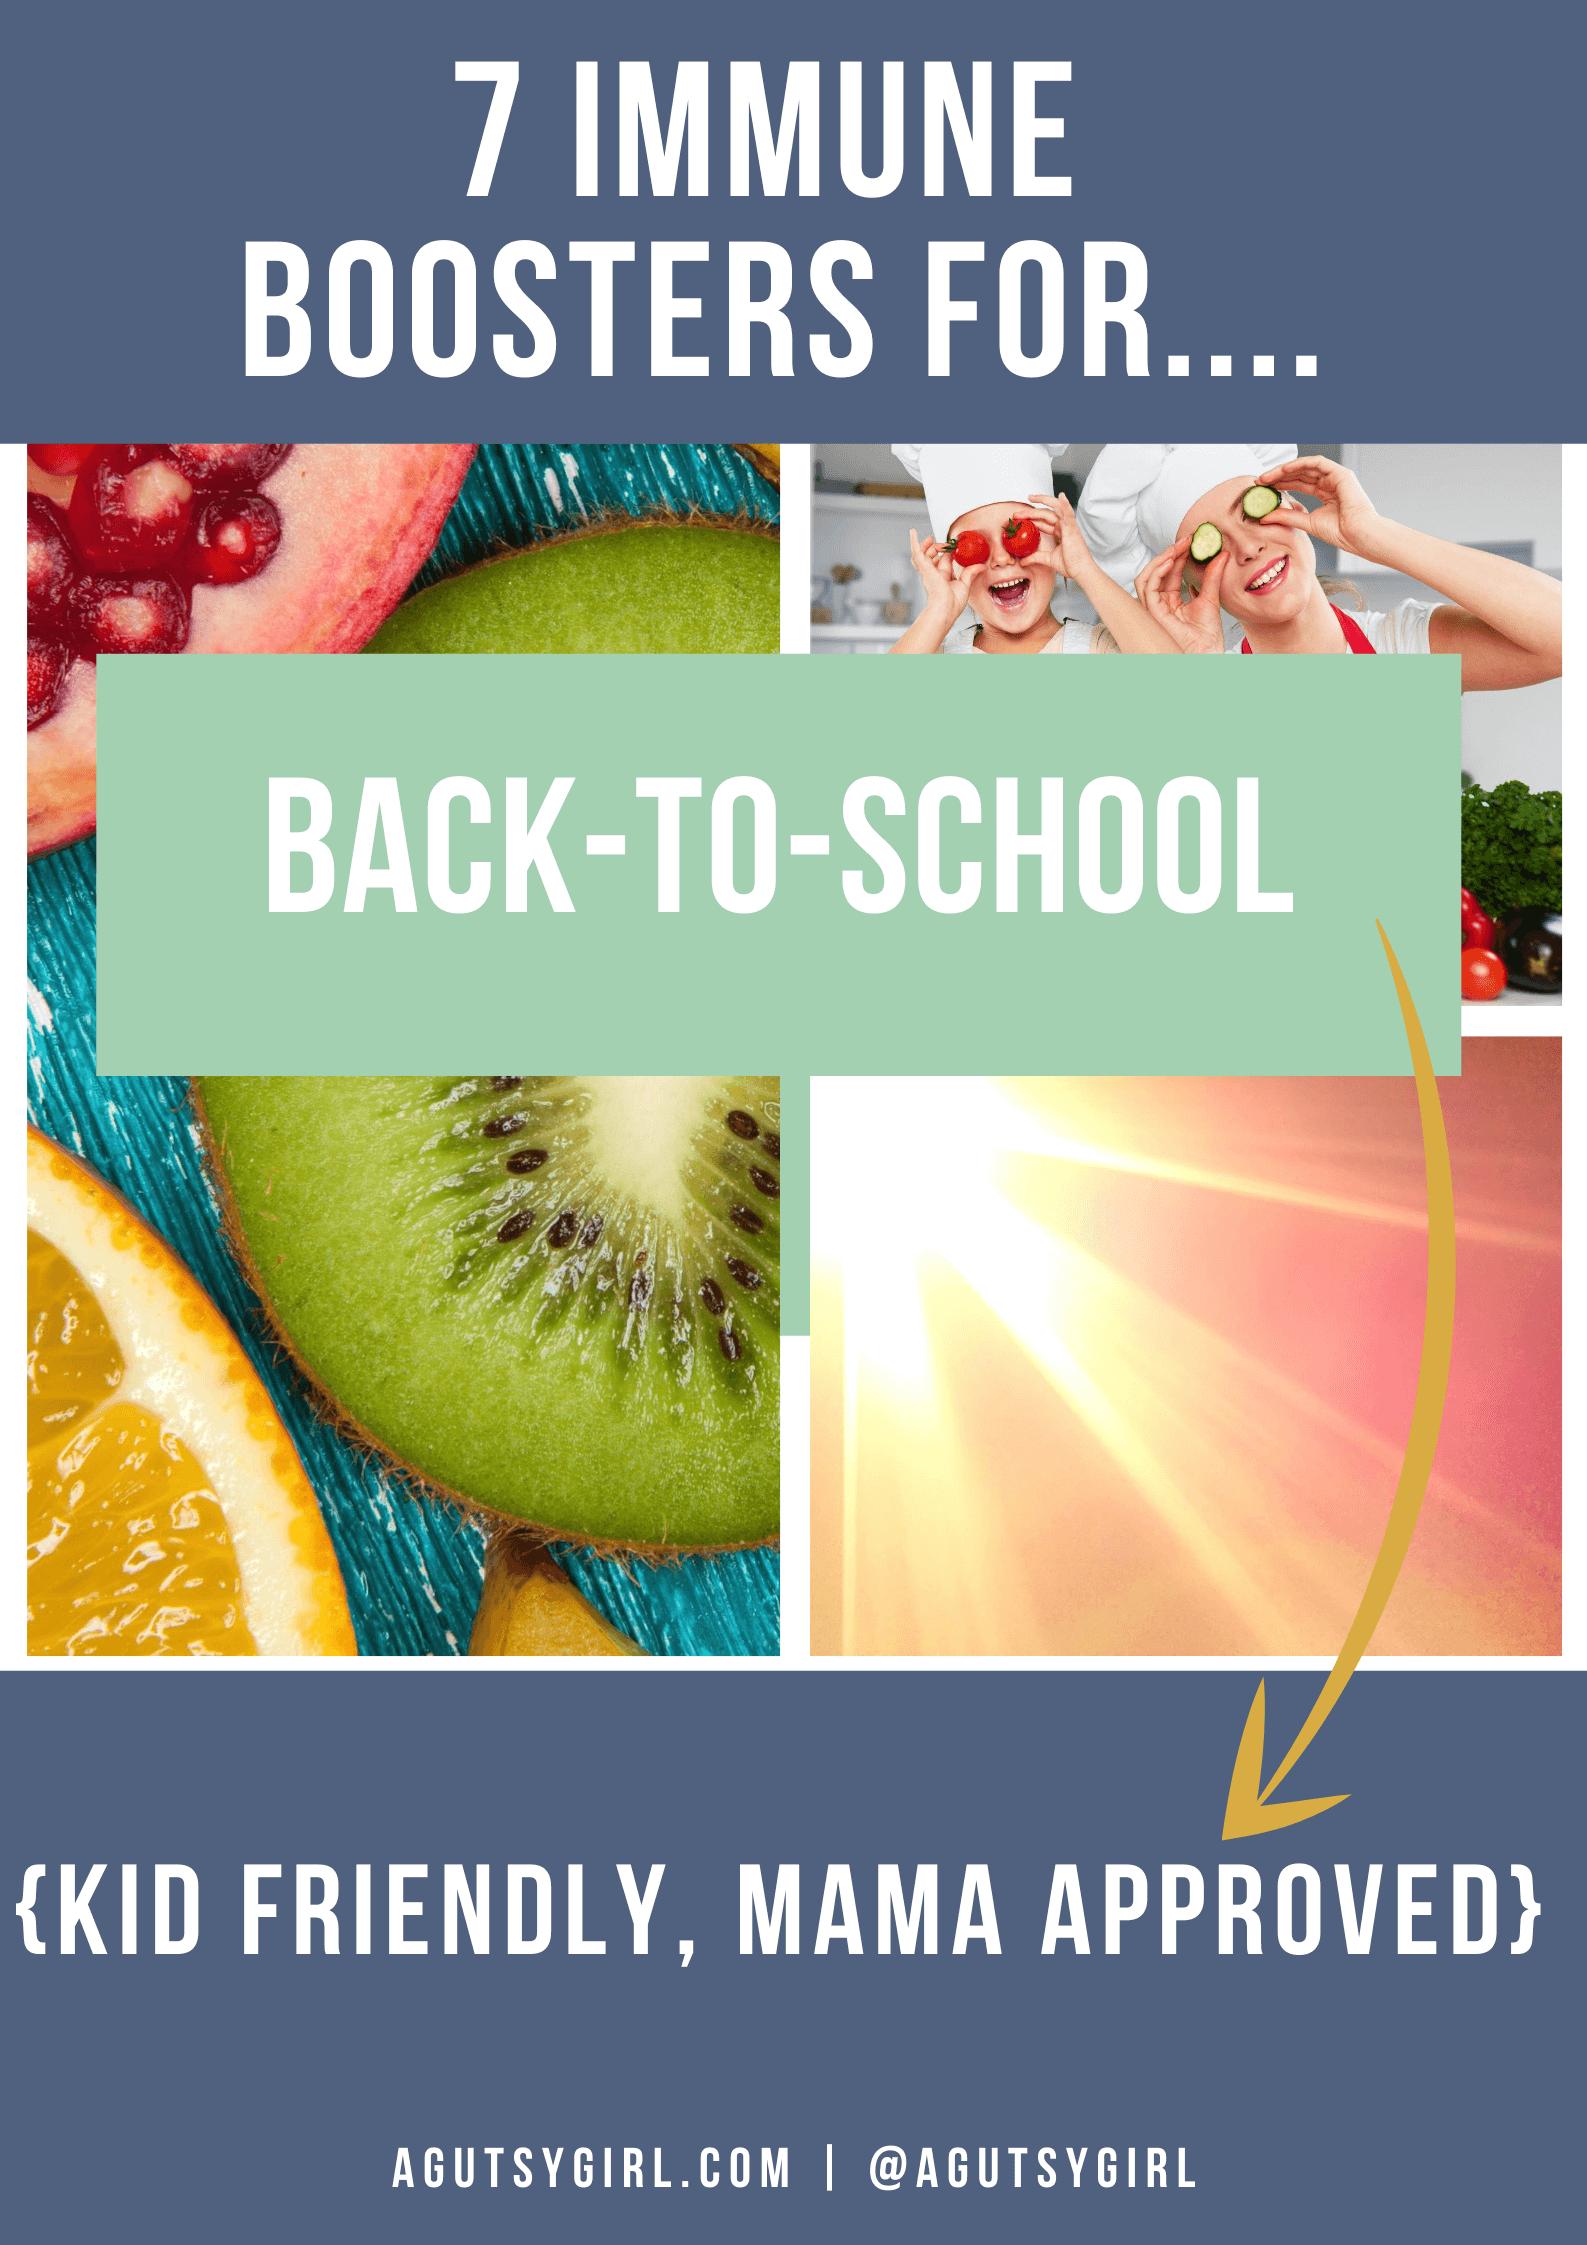 7 Immune Boosters for Back-to-School agutsygirl.com #immuneboost #backtoschool #kidsimmunesystem